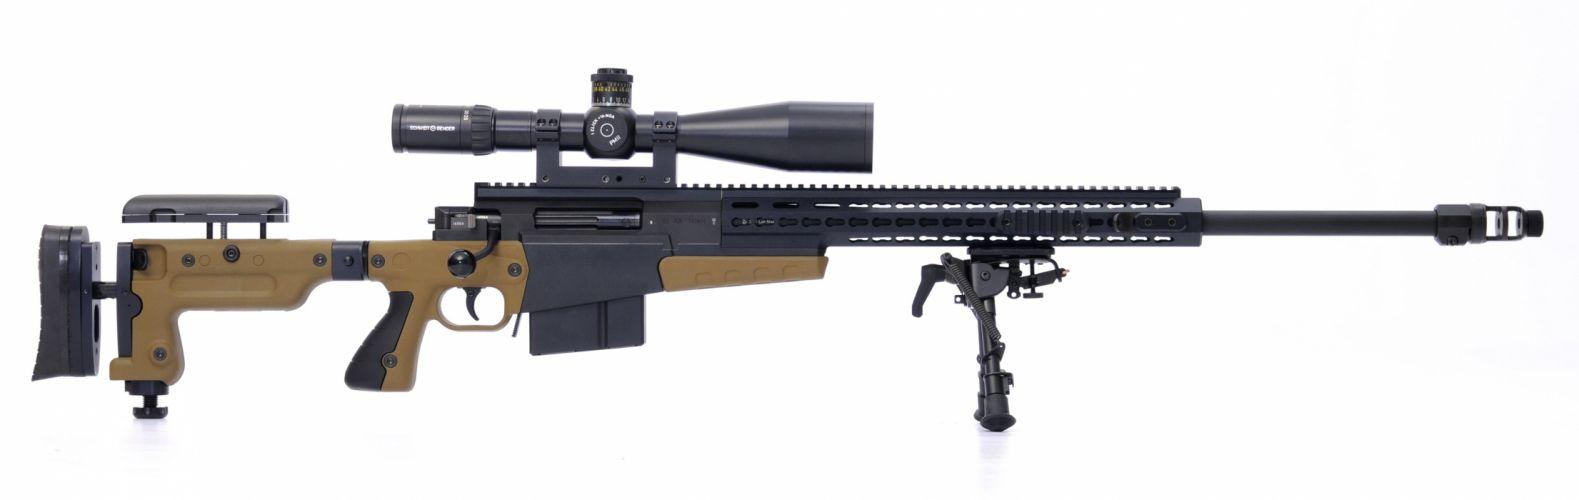 ACCURACY INTERNATIONAL sniper rifle weapon gun police military (12) wallpaper